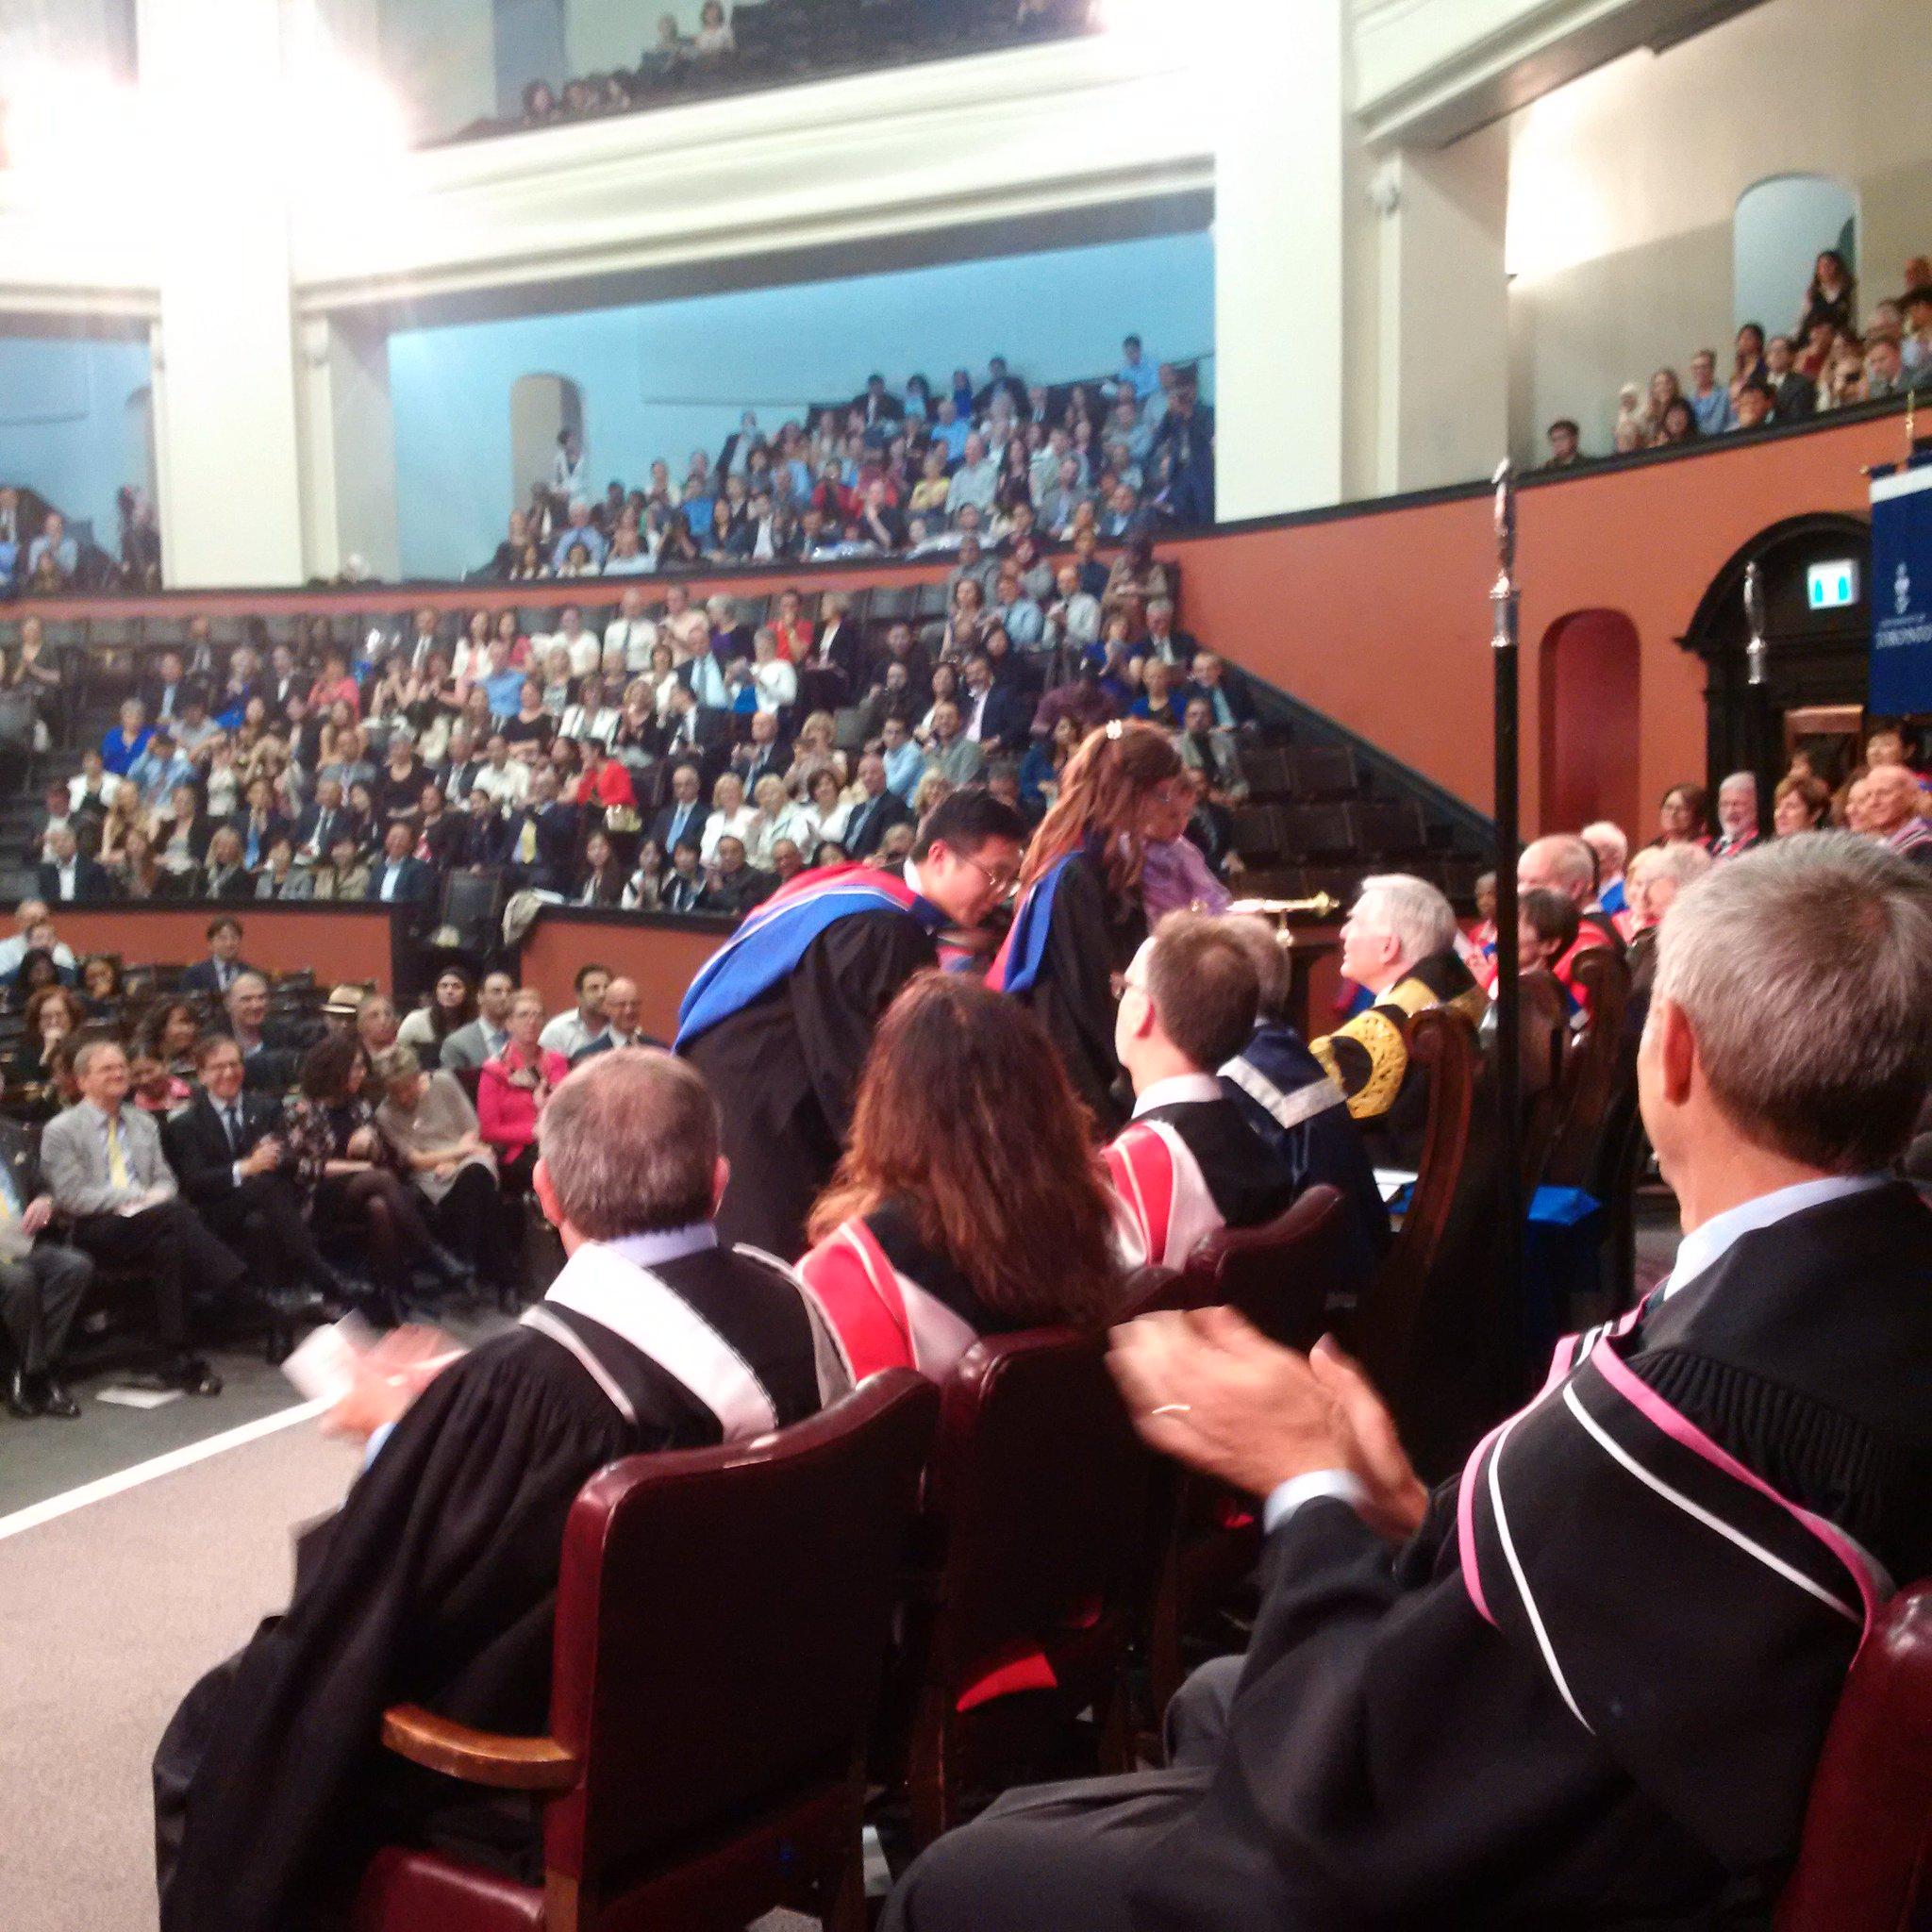 Graduate Yael Feinberg brings her daughter to meet Chancellor Wilson. #UofTGrad17 #UofTMed https://t.co/tZDXLJ8QMl